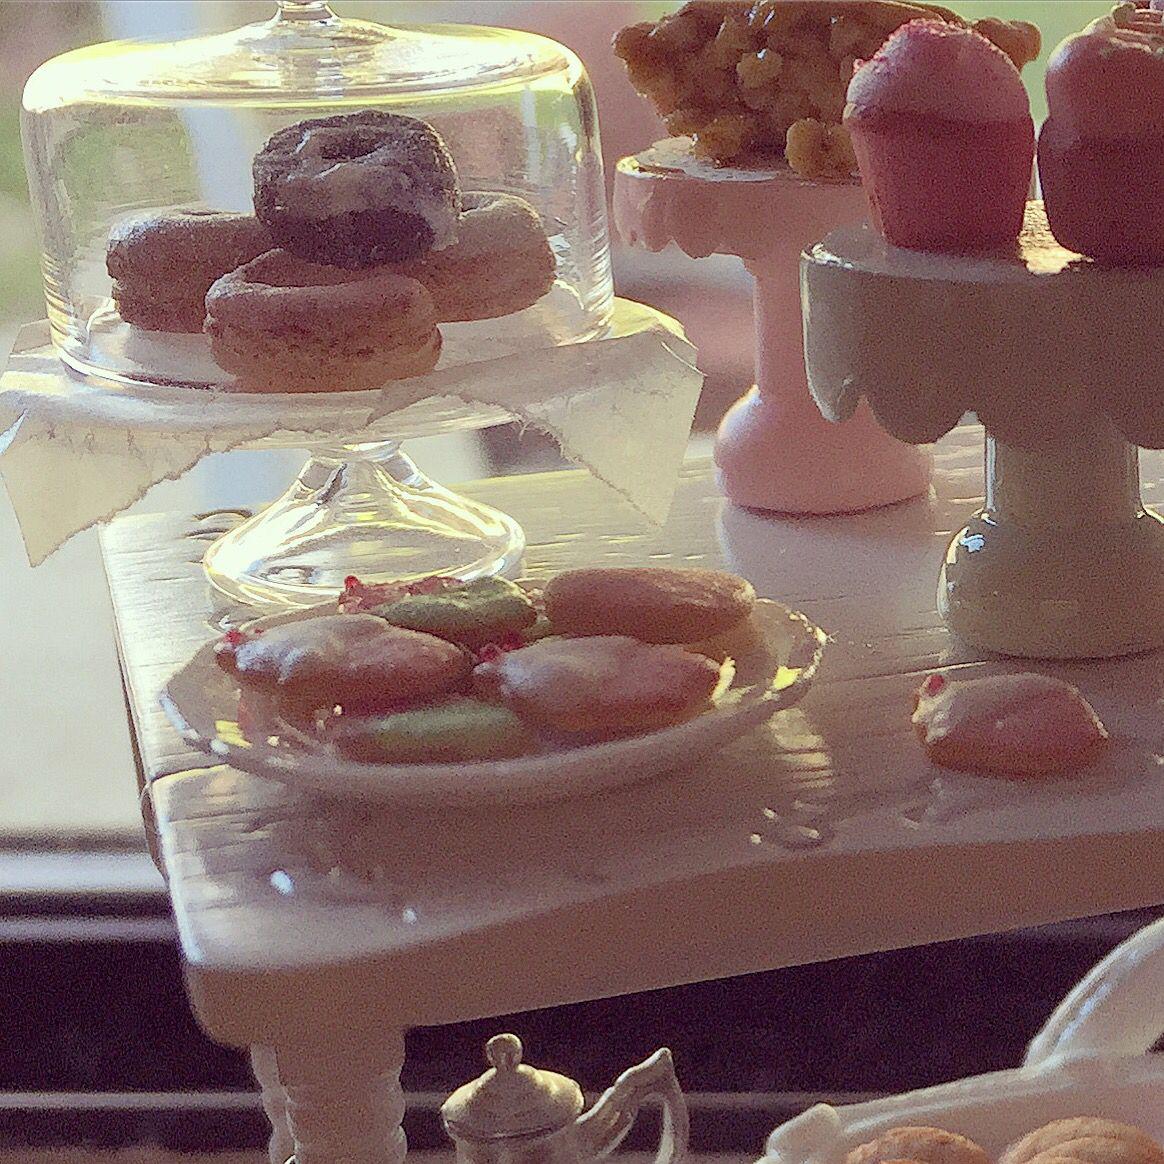 Miniature tea party 1:12 by Kim Saulter